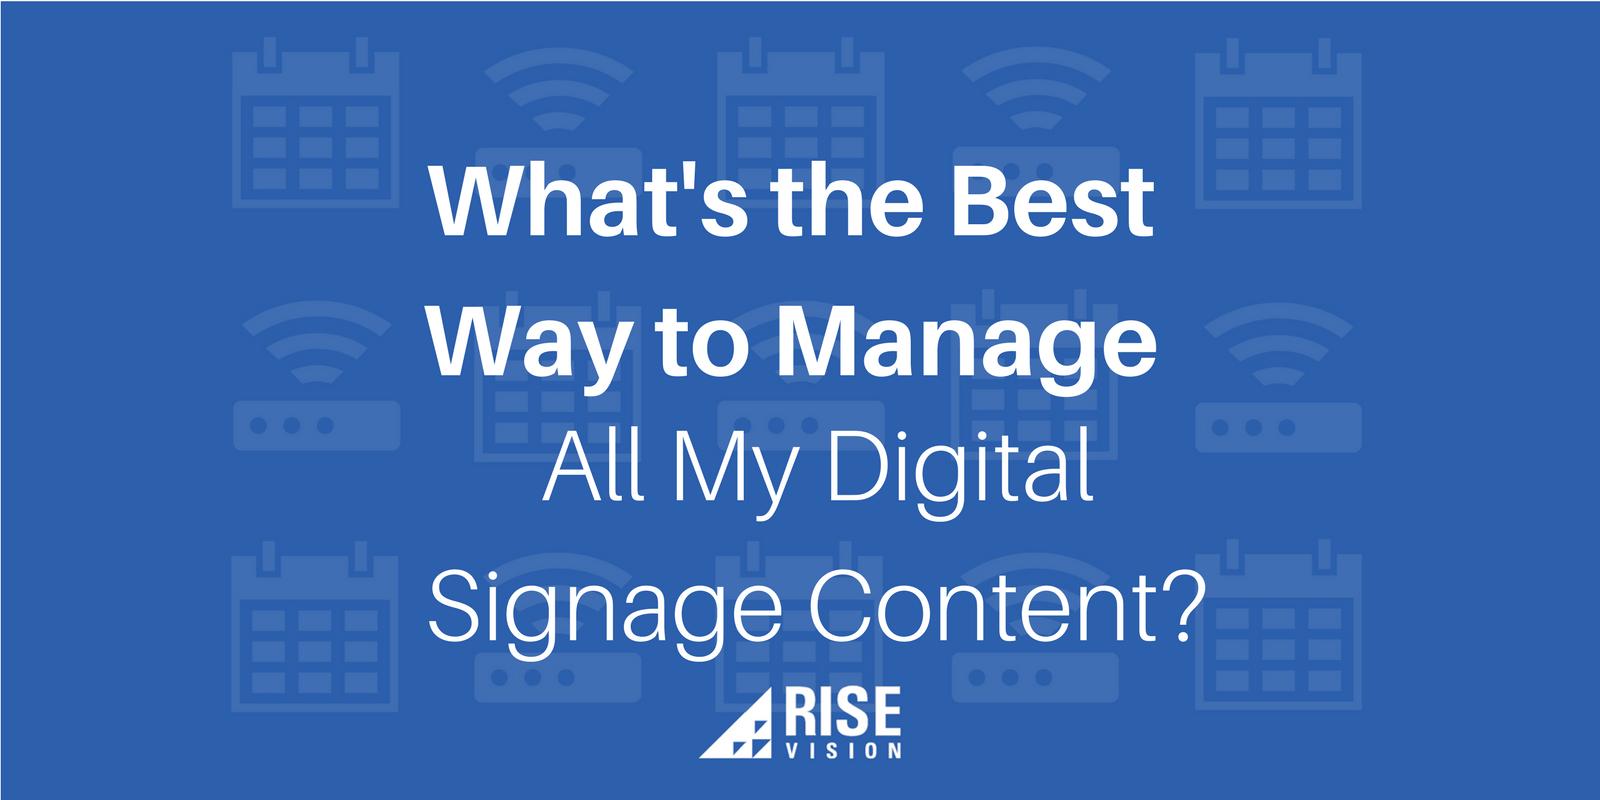 Rise Vision Digital Signage Content Management.png